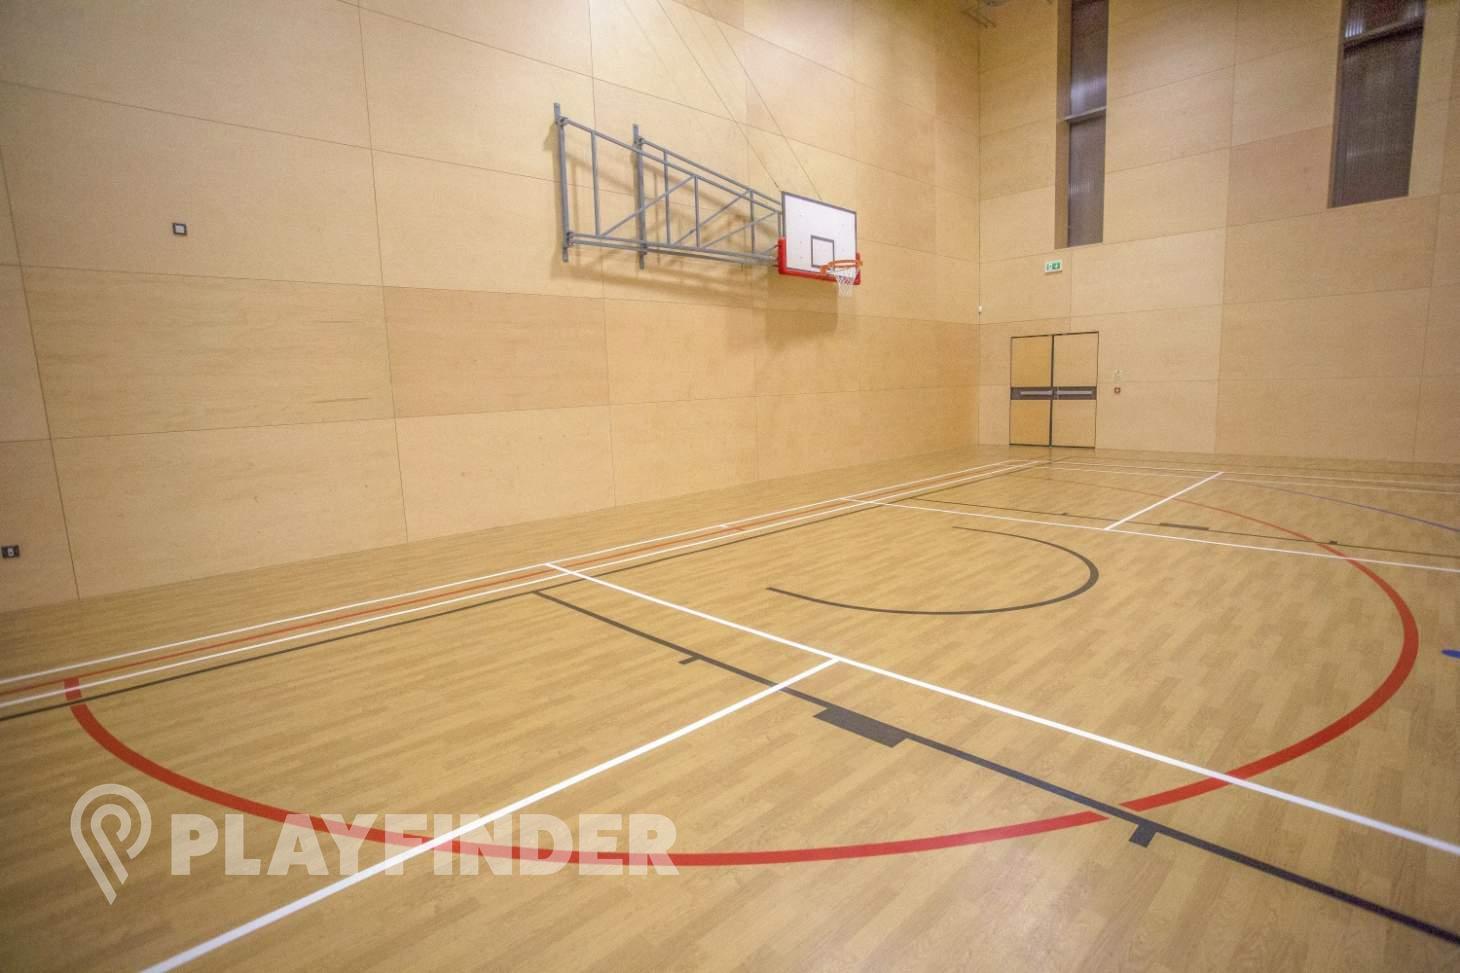 Harris Academy Bromley Indoor basketball court